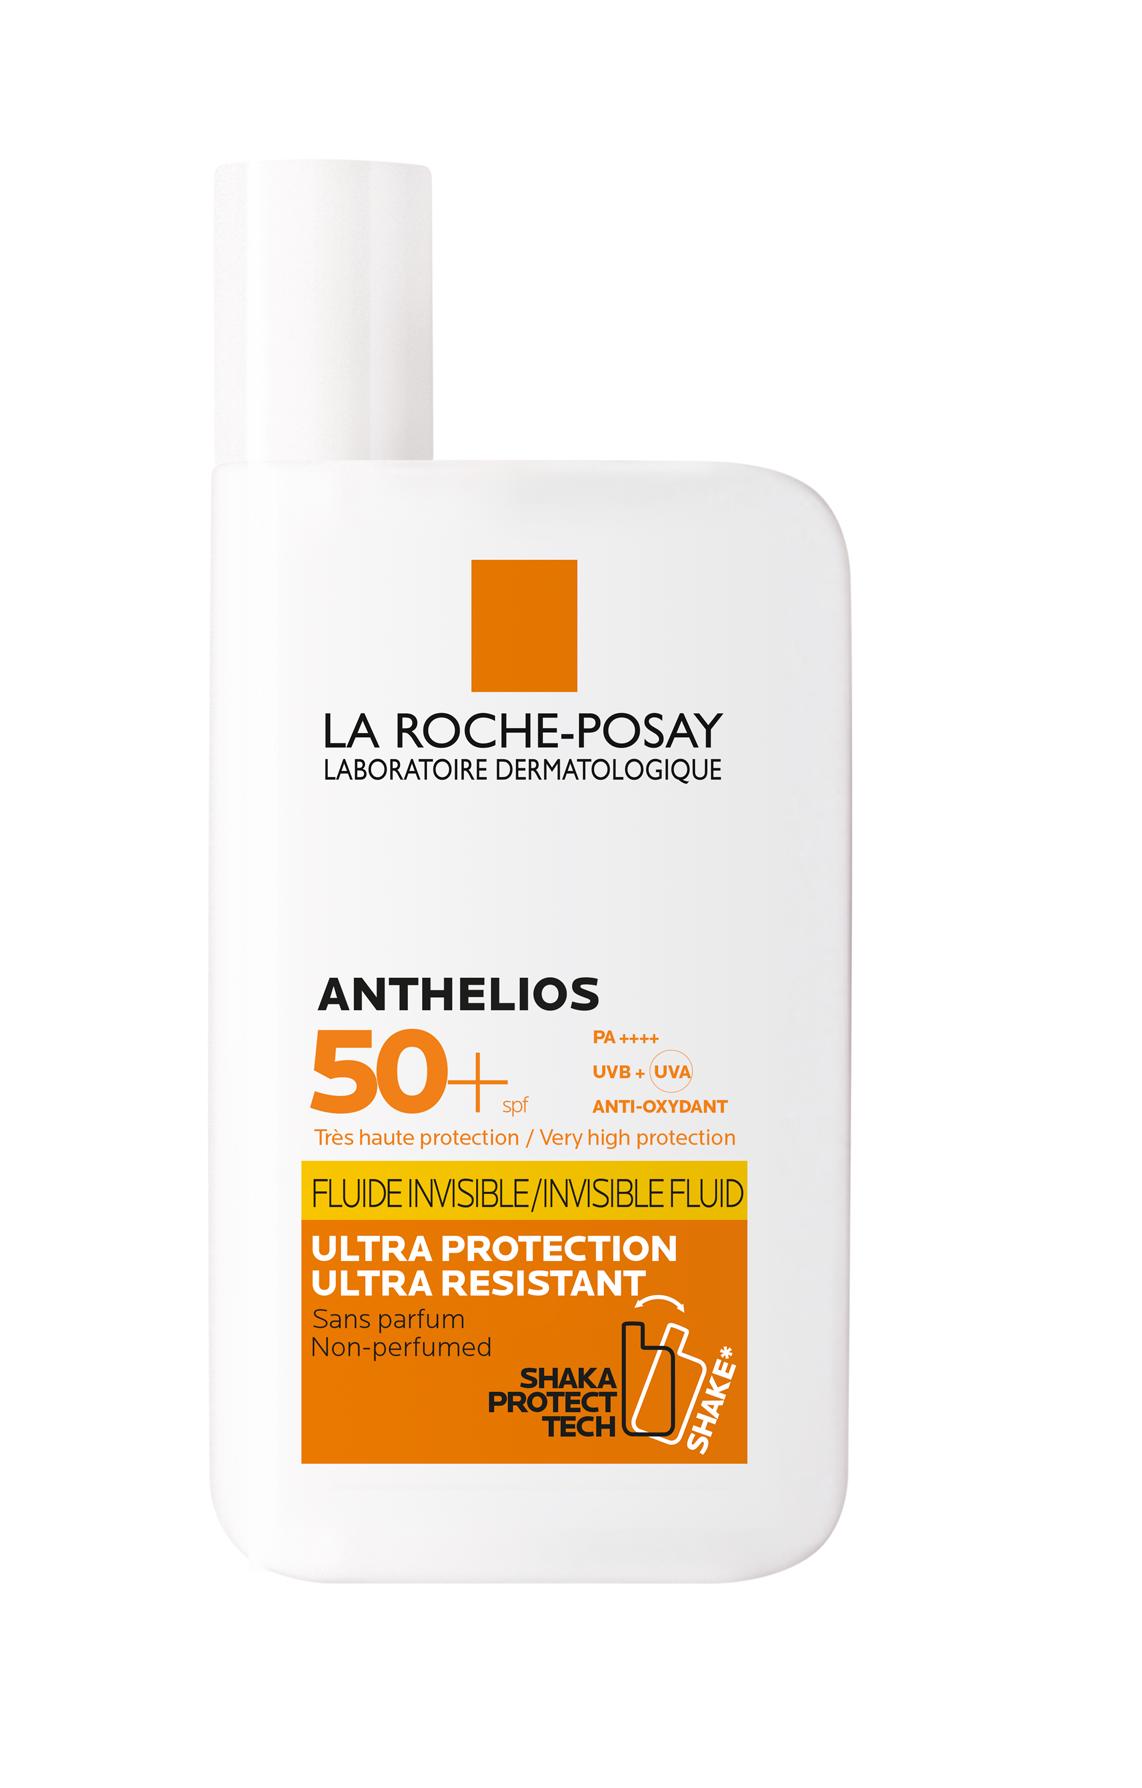 La Roche-Posay ANTHELIOS XL  全效廣譜防曬系列系列的ANTHELIOS Invisible Fluid SPF50+ 全效廣譜輕盈隔離乳液 SPF50+  產品圖片